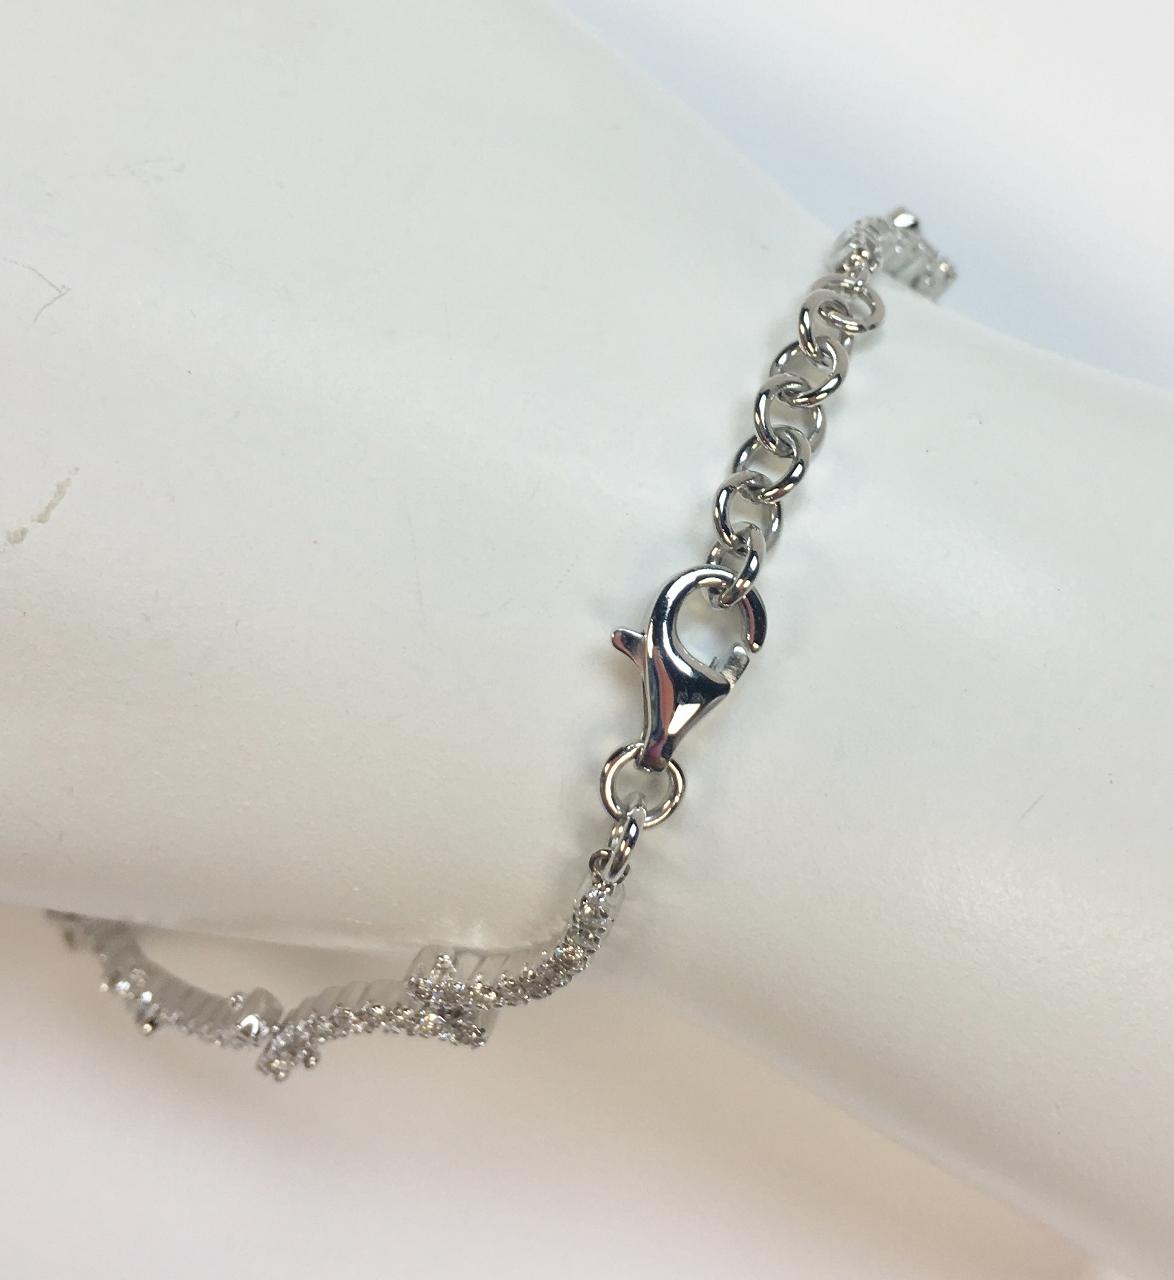 1.50 Carats Diamond Bracelet In White Gold